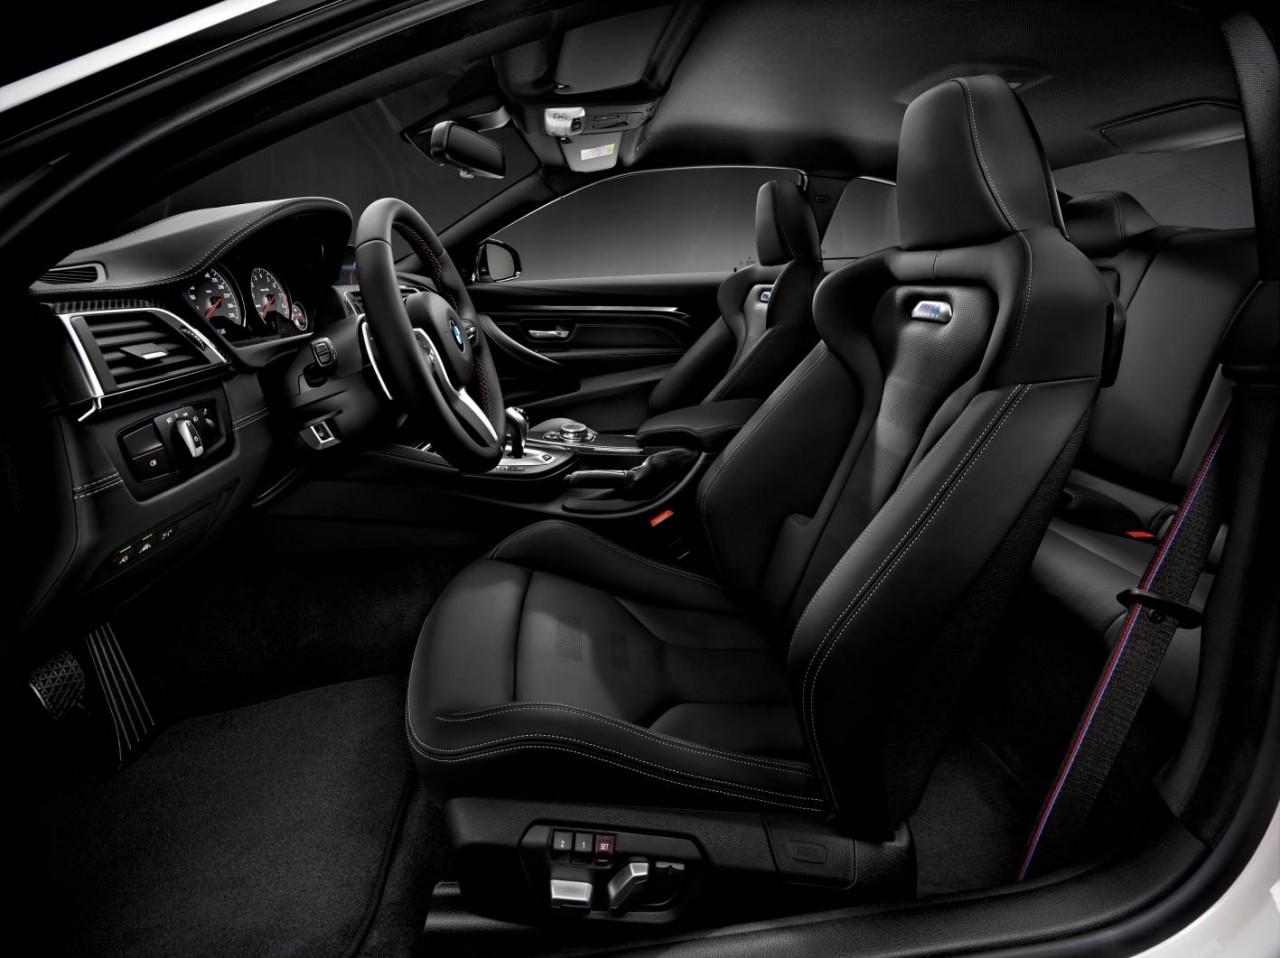 2016 bmw m4 interior